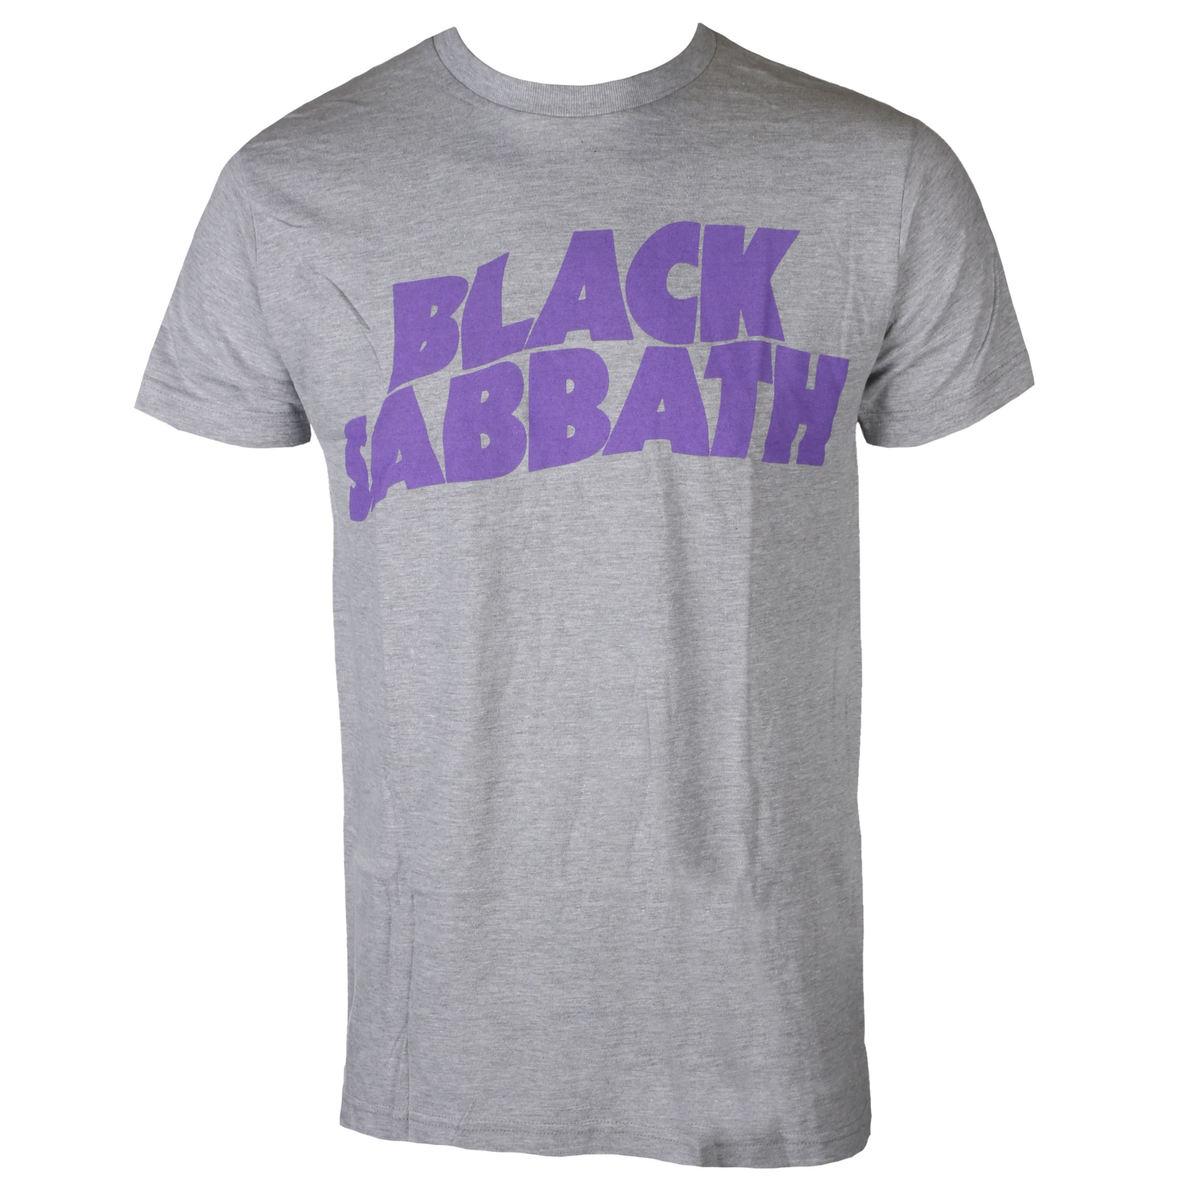 tričko pánske BLACK SABBATH - PURPLE LGO T GRY - BRAVADO - 34191140